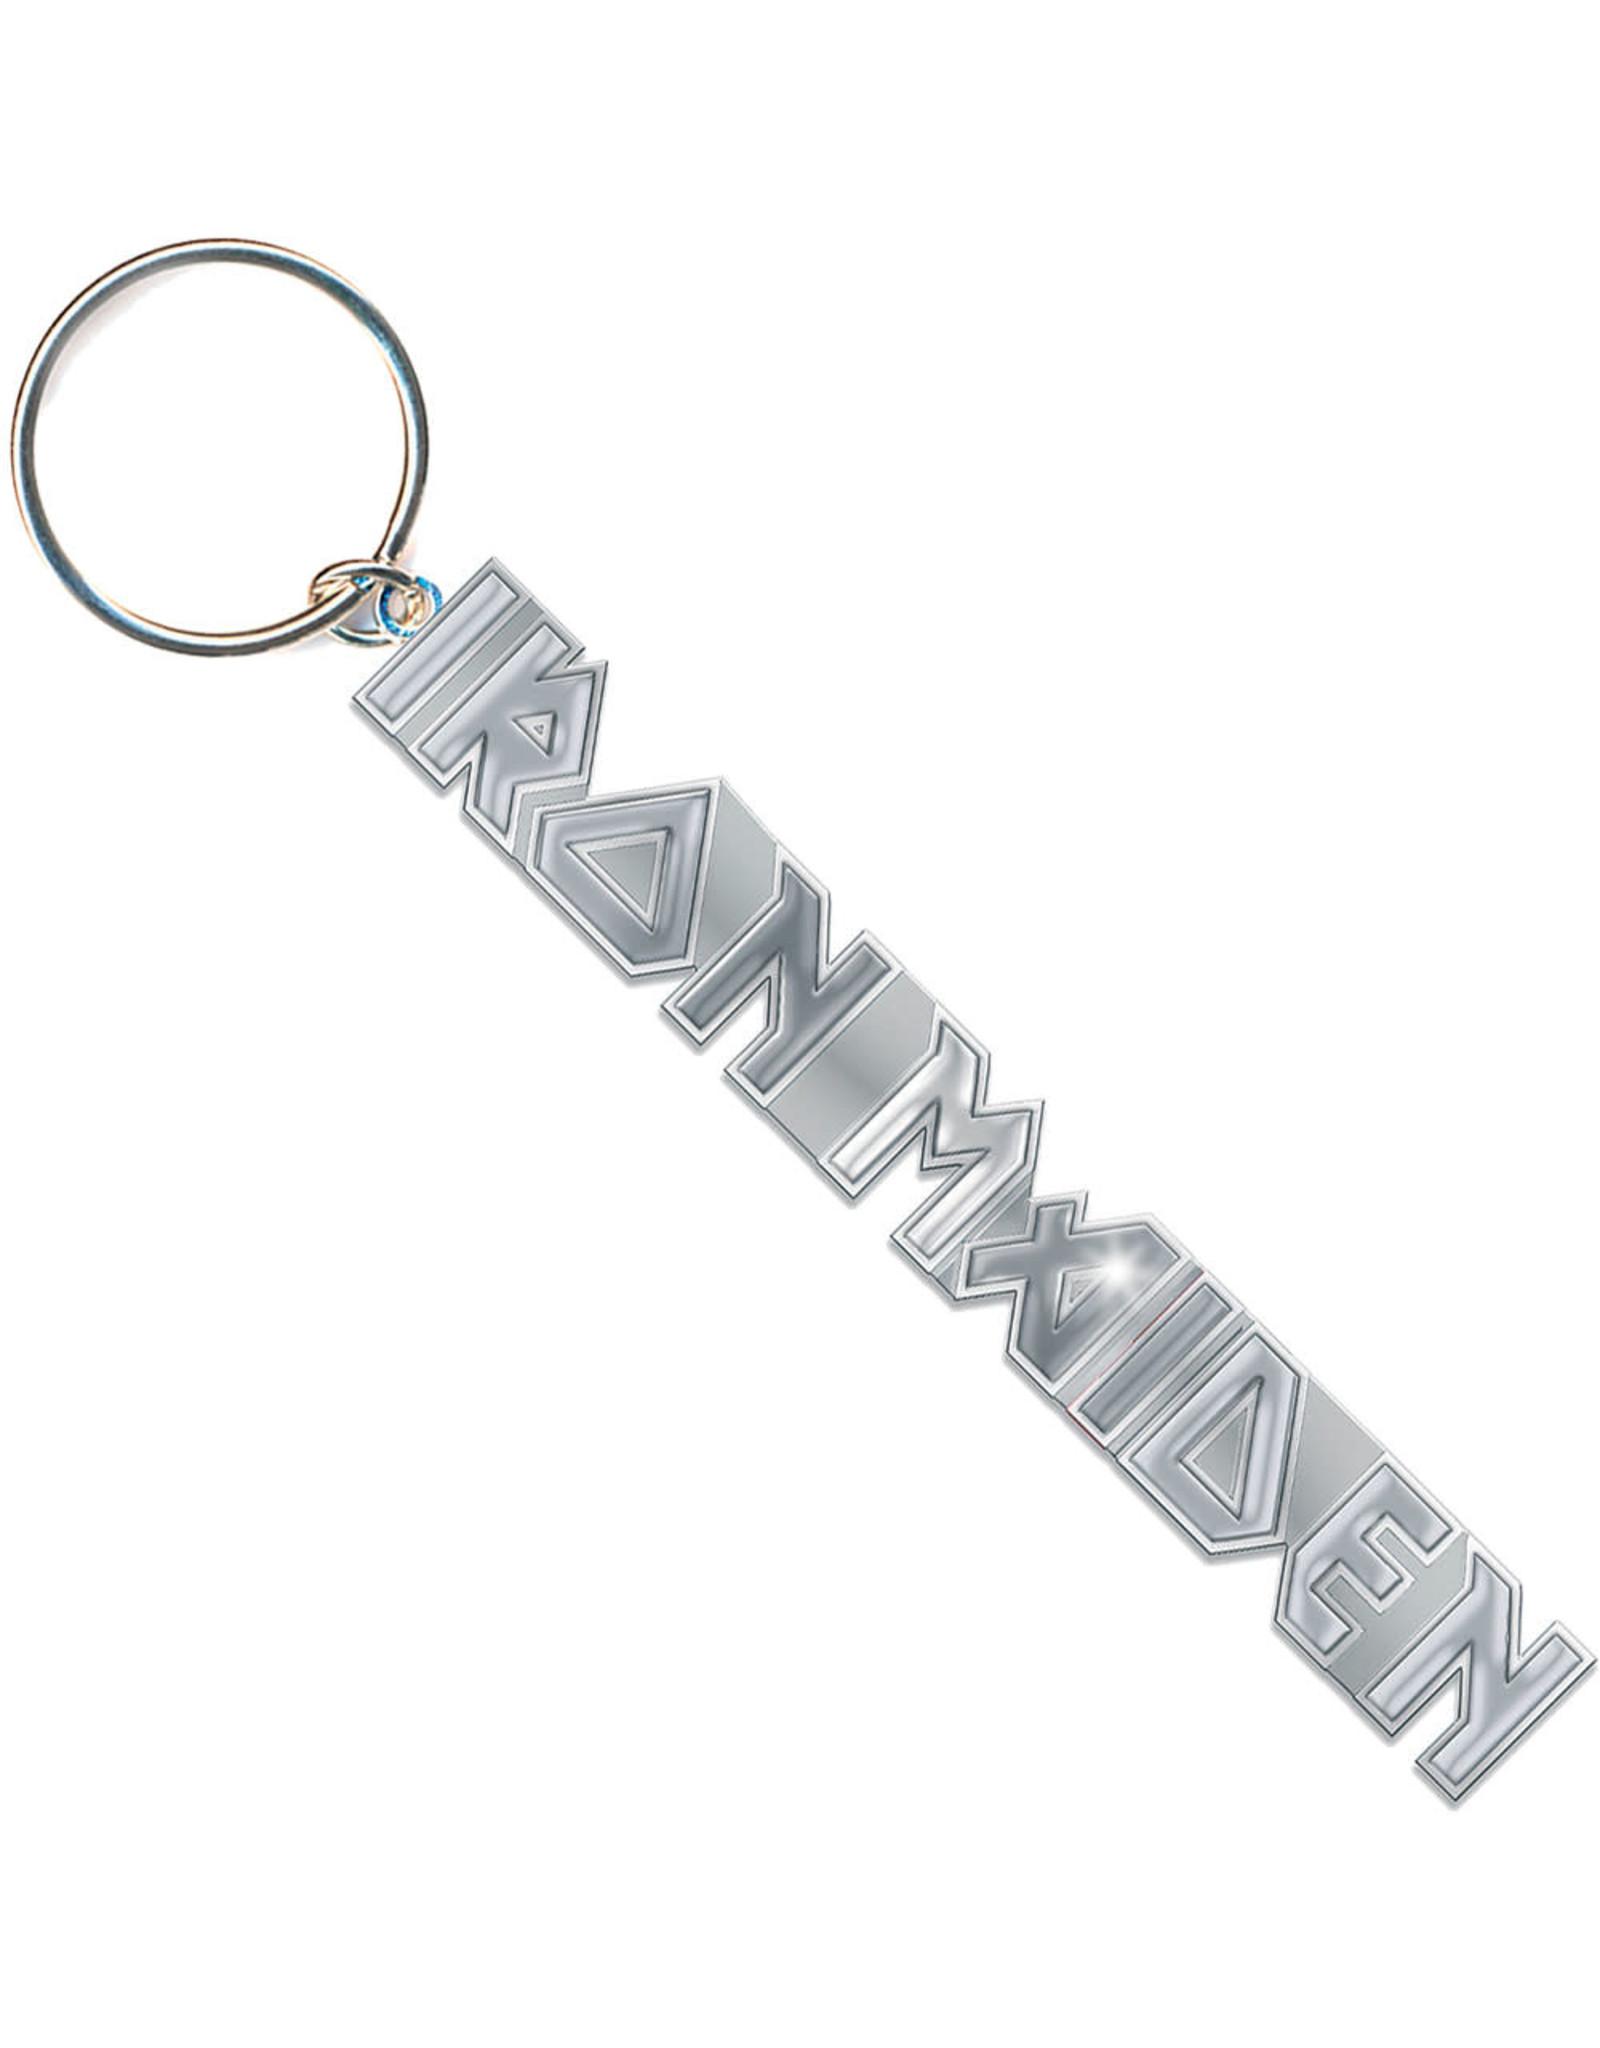 Iron Maiden / Classic Logo Keychain